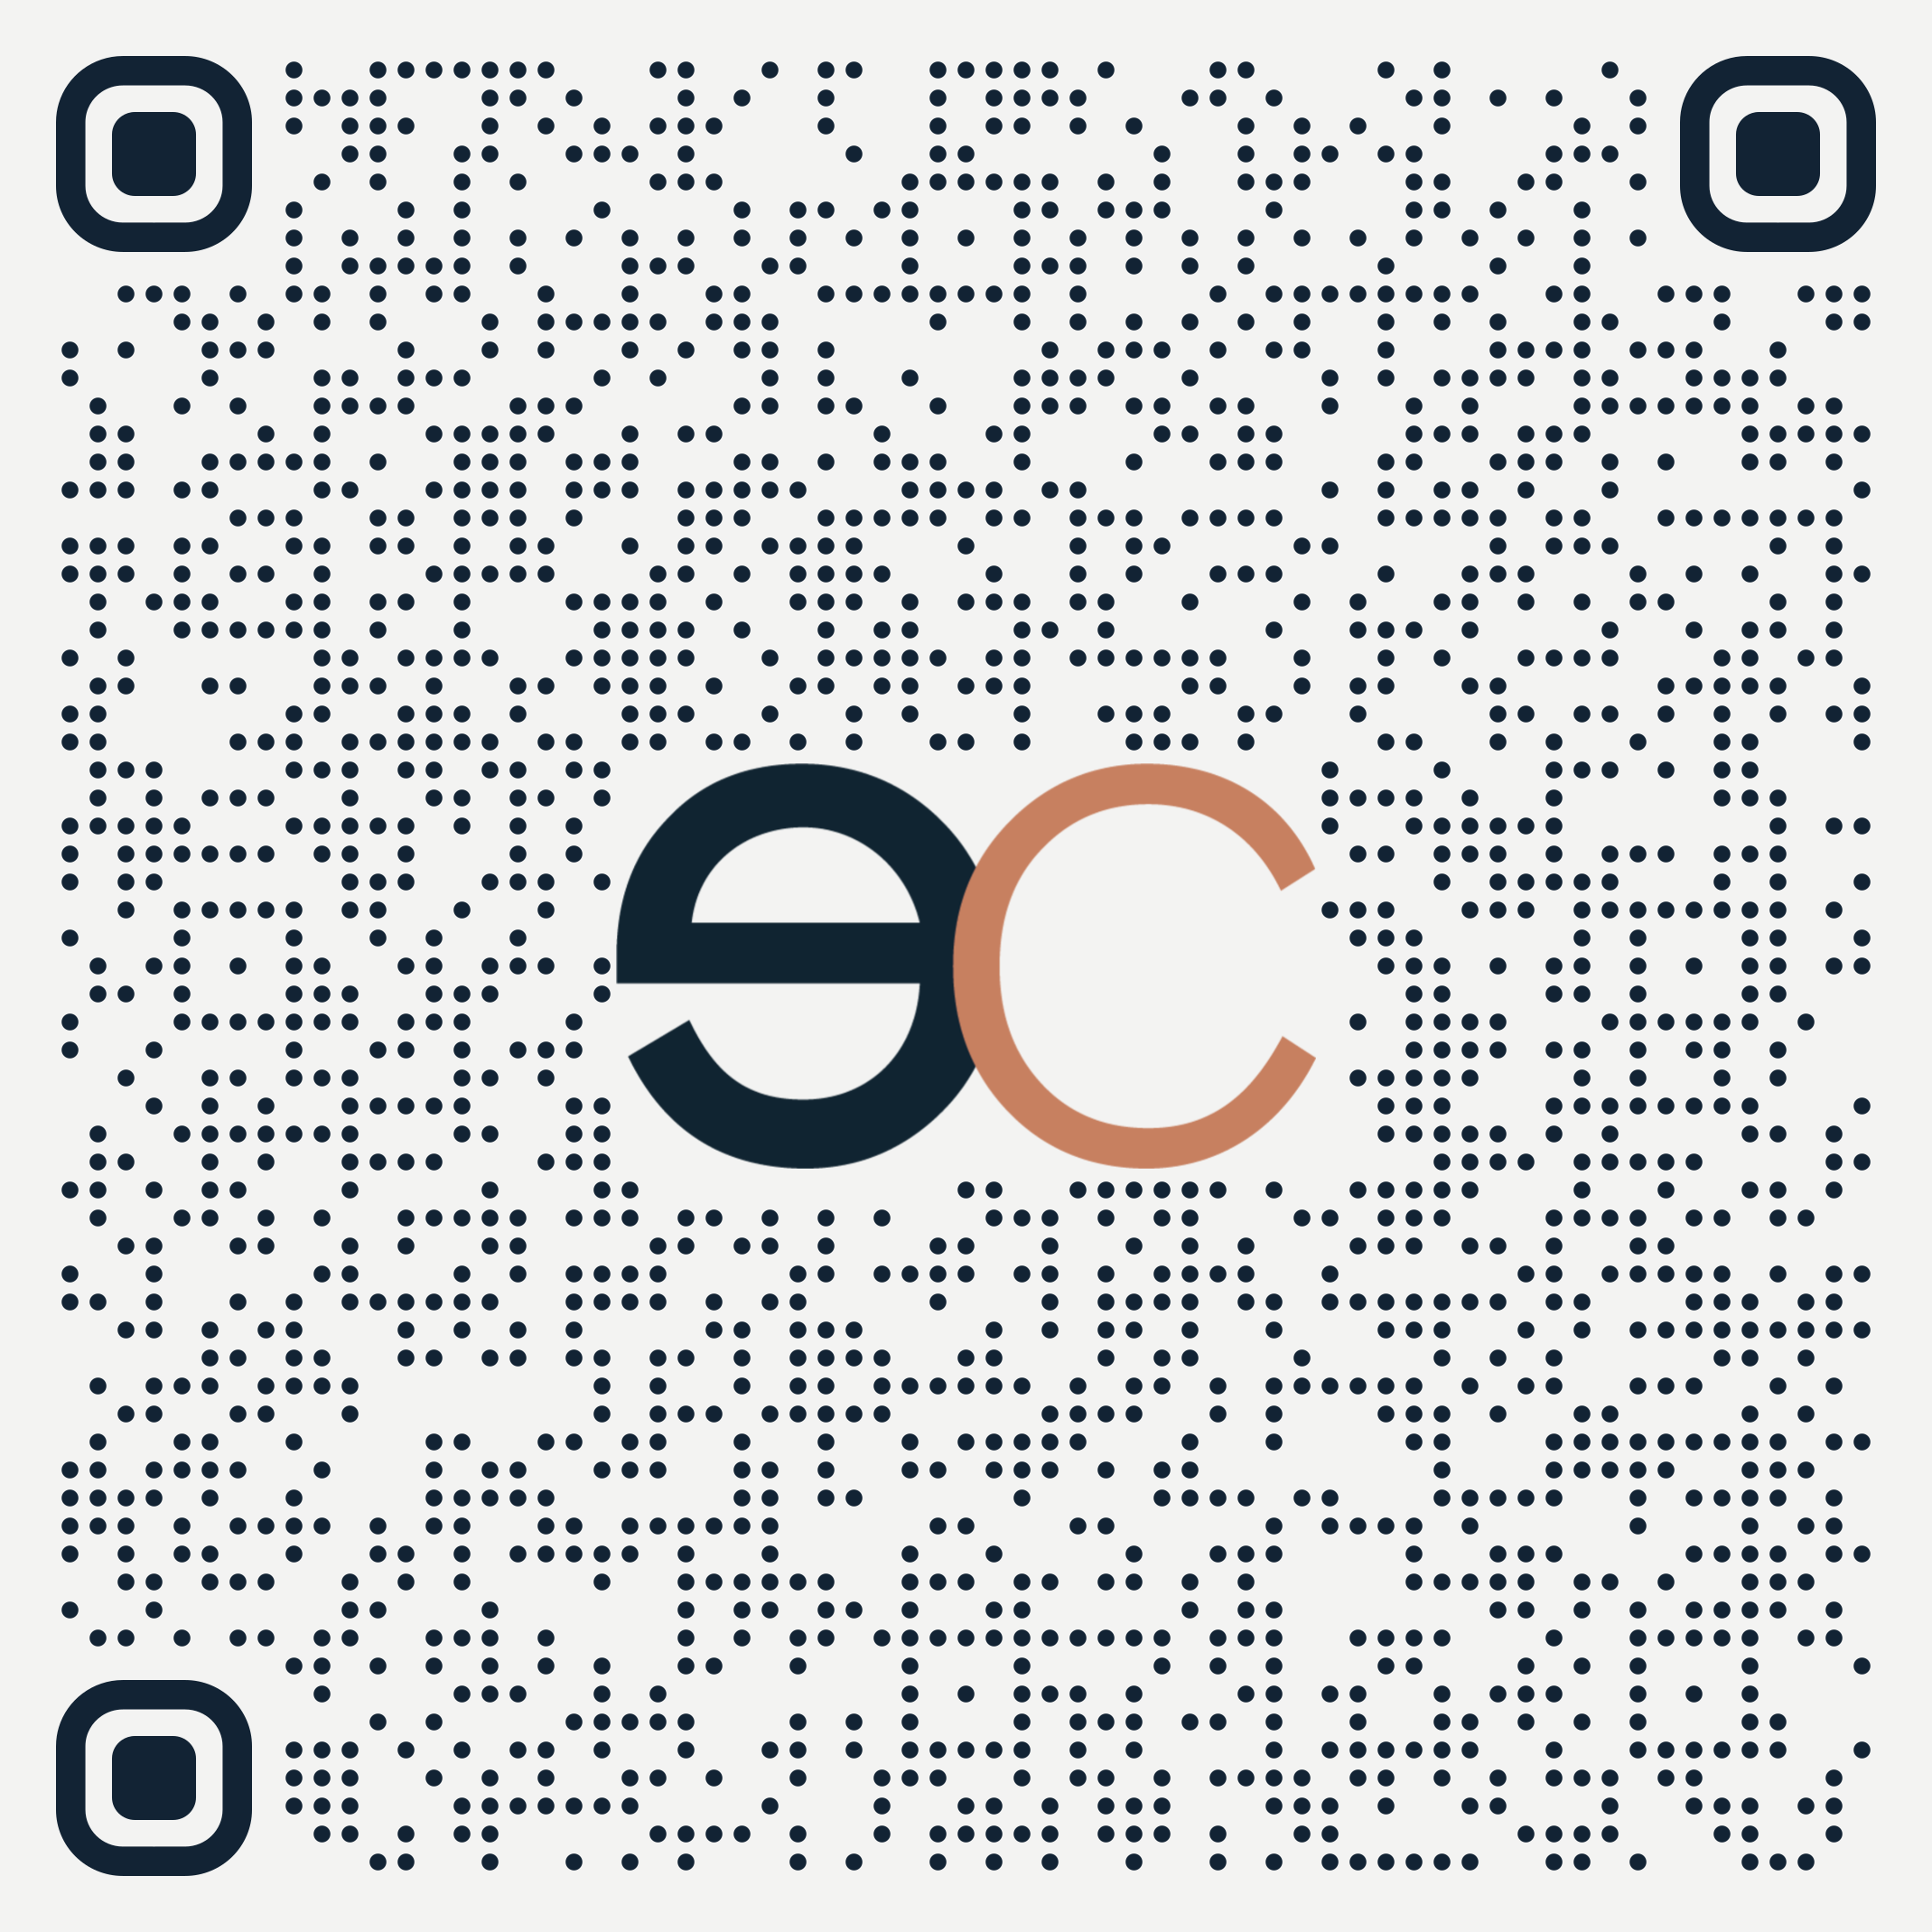 qr-code_Digitales-Gaestebuch_Muster-GmbH